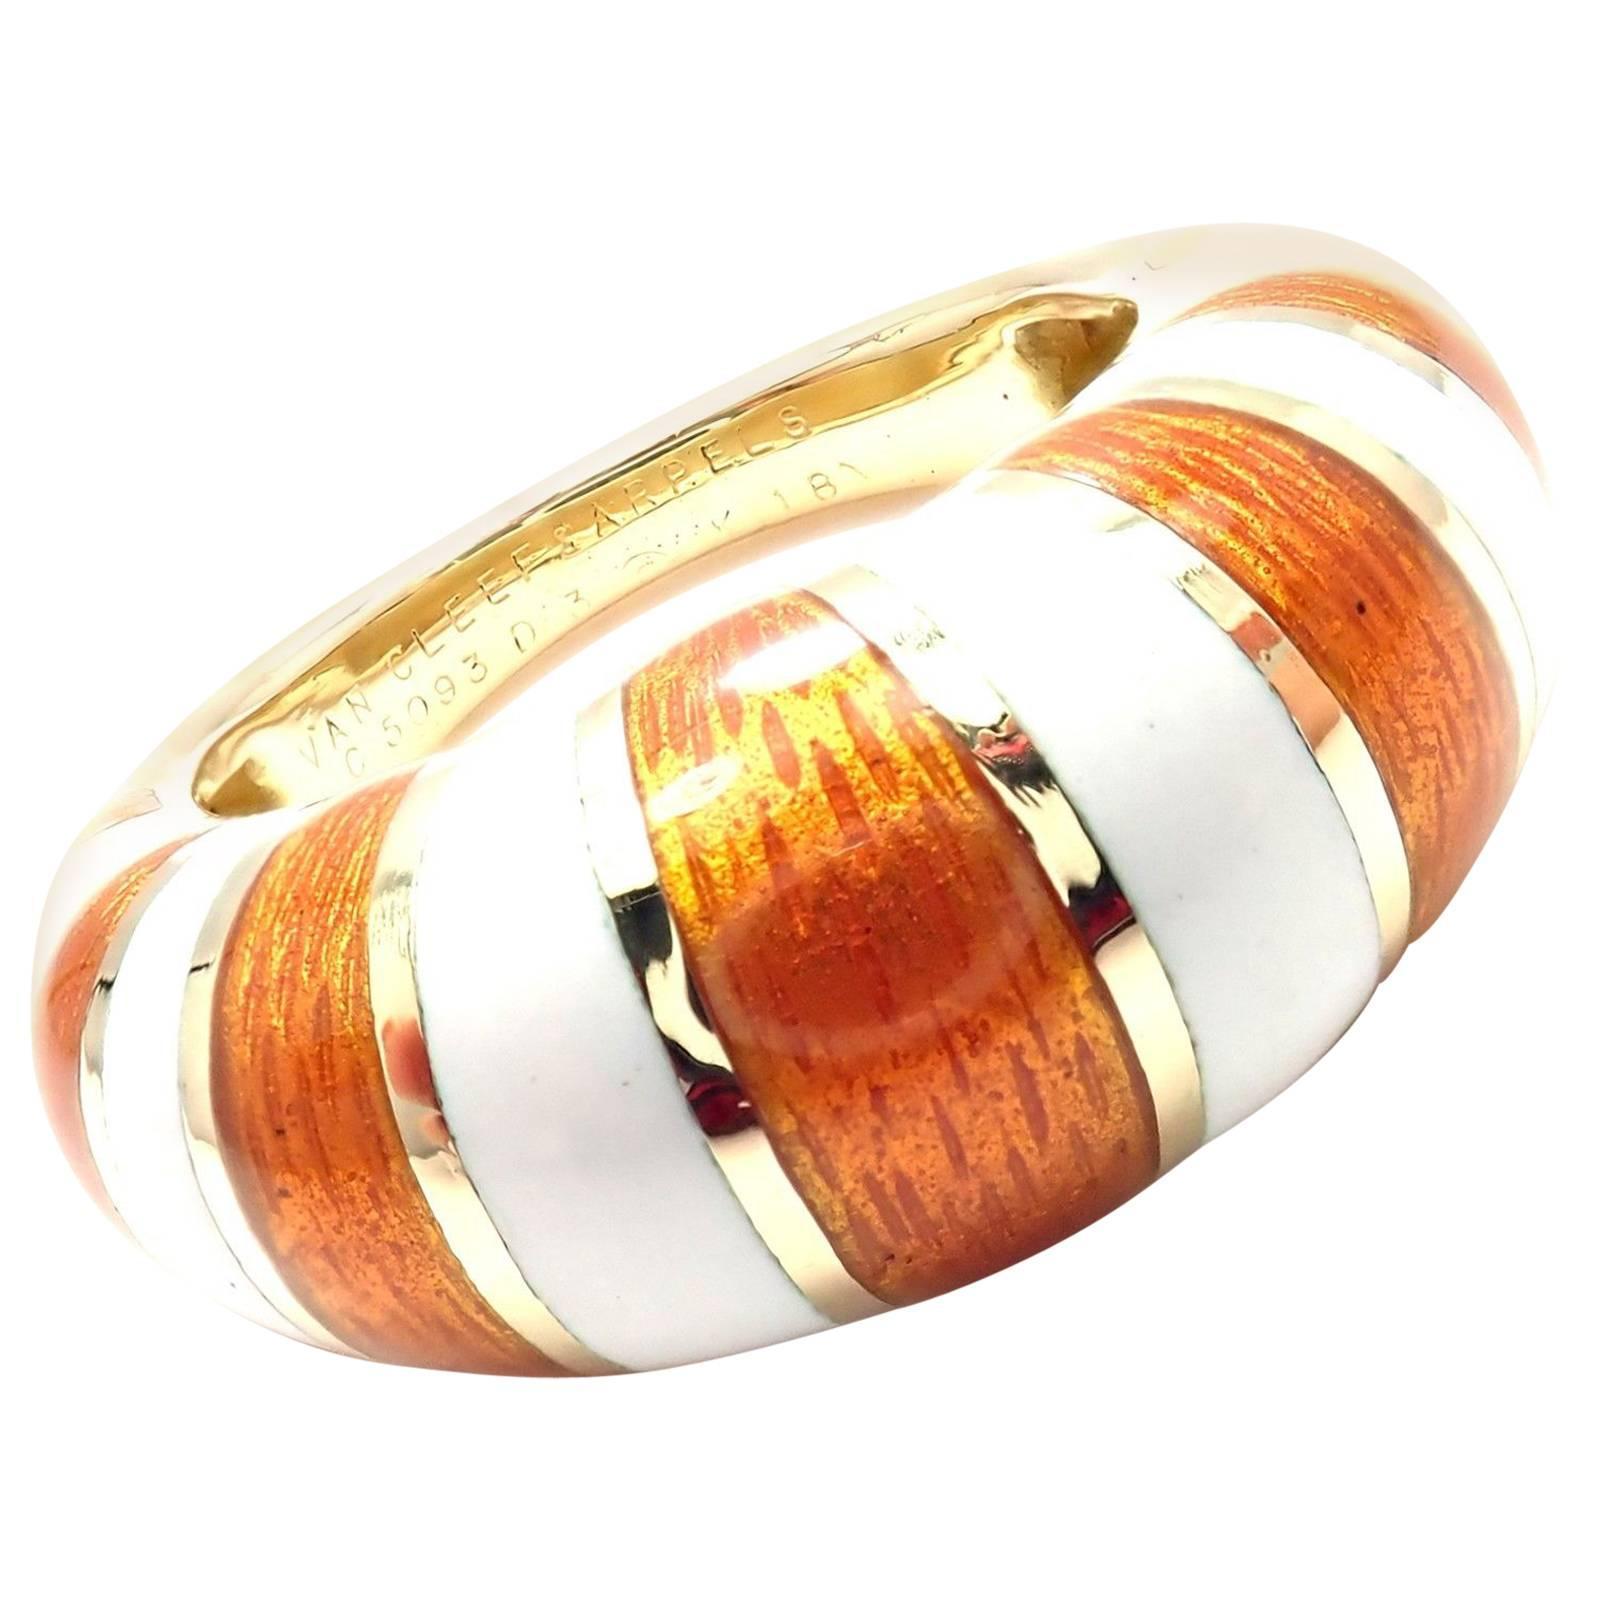 Van Cleef & Arpels Vintage Enamel Yellow Gold Band Ring